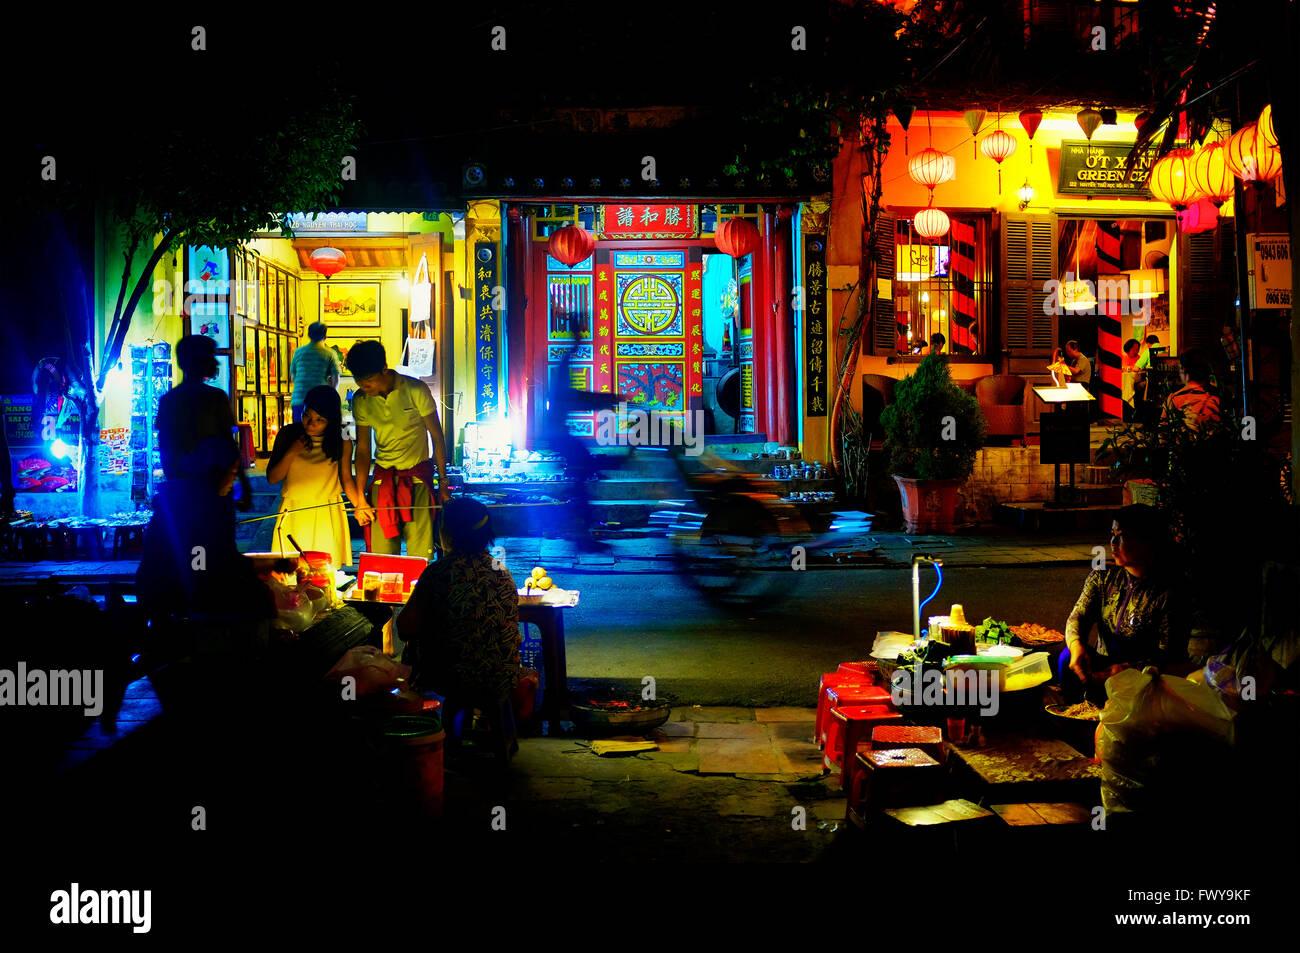 Nguyen Thai Hoc street at night, Hoi An, Vietnam - Stock Image